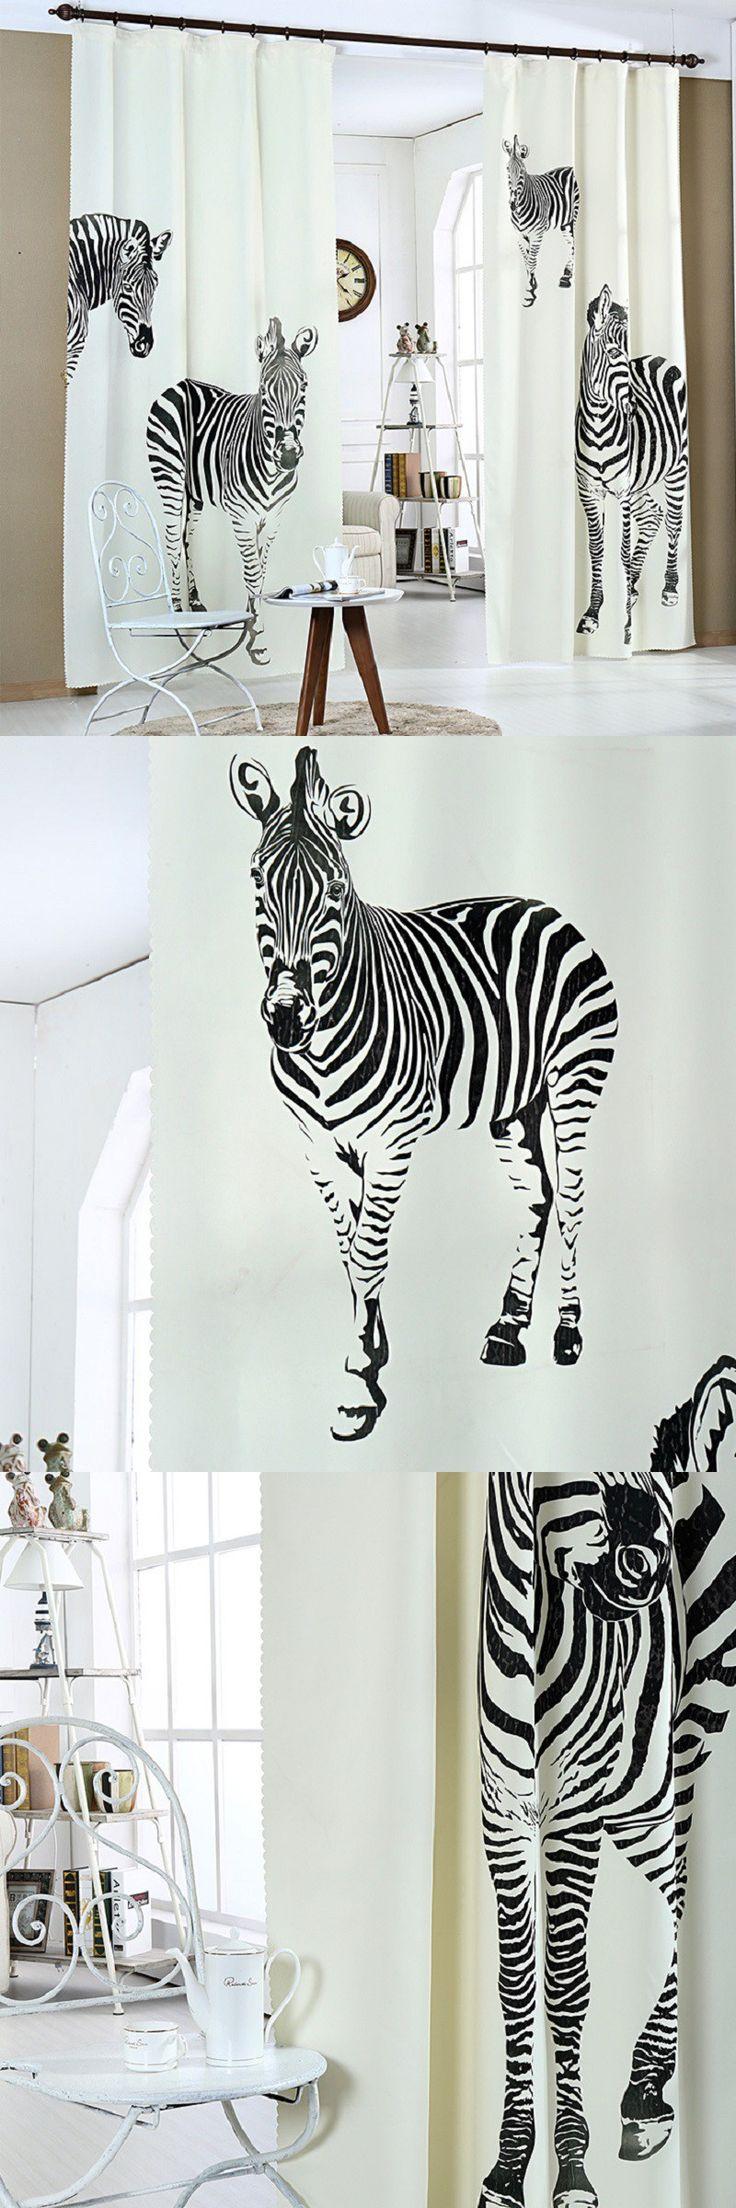 3D curtains for kids room zebra pattern Cartoon 3d curtains for living room luxury 3d curtains Printed cortinas de bano Decor $55.77